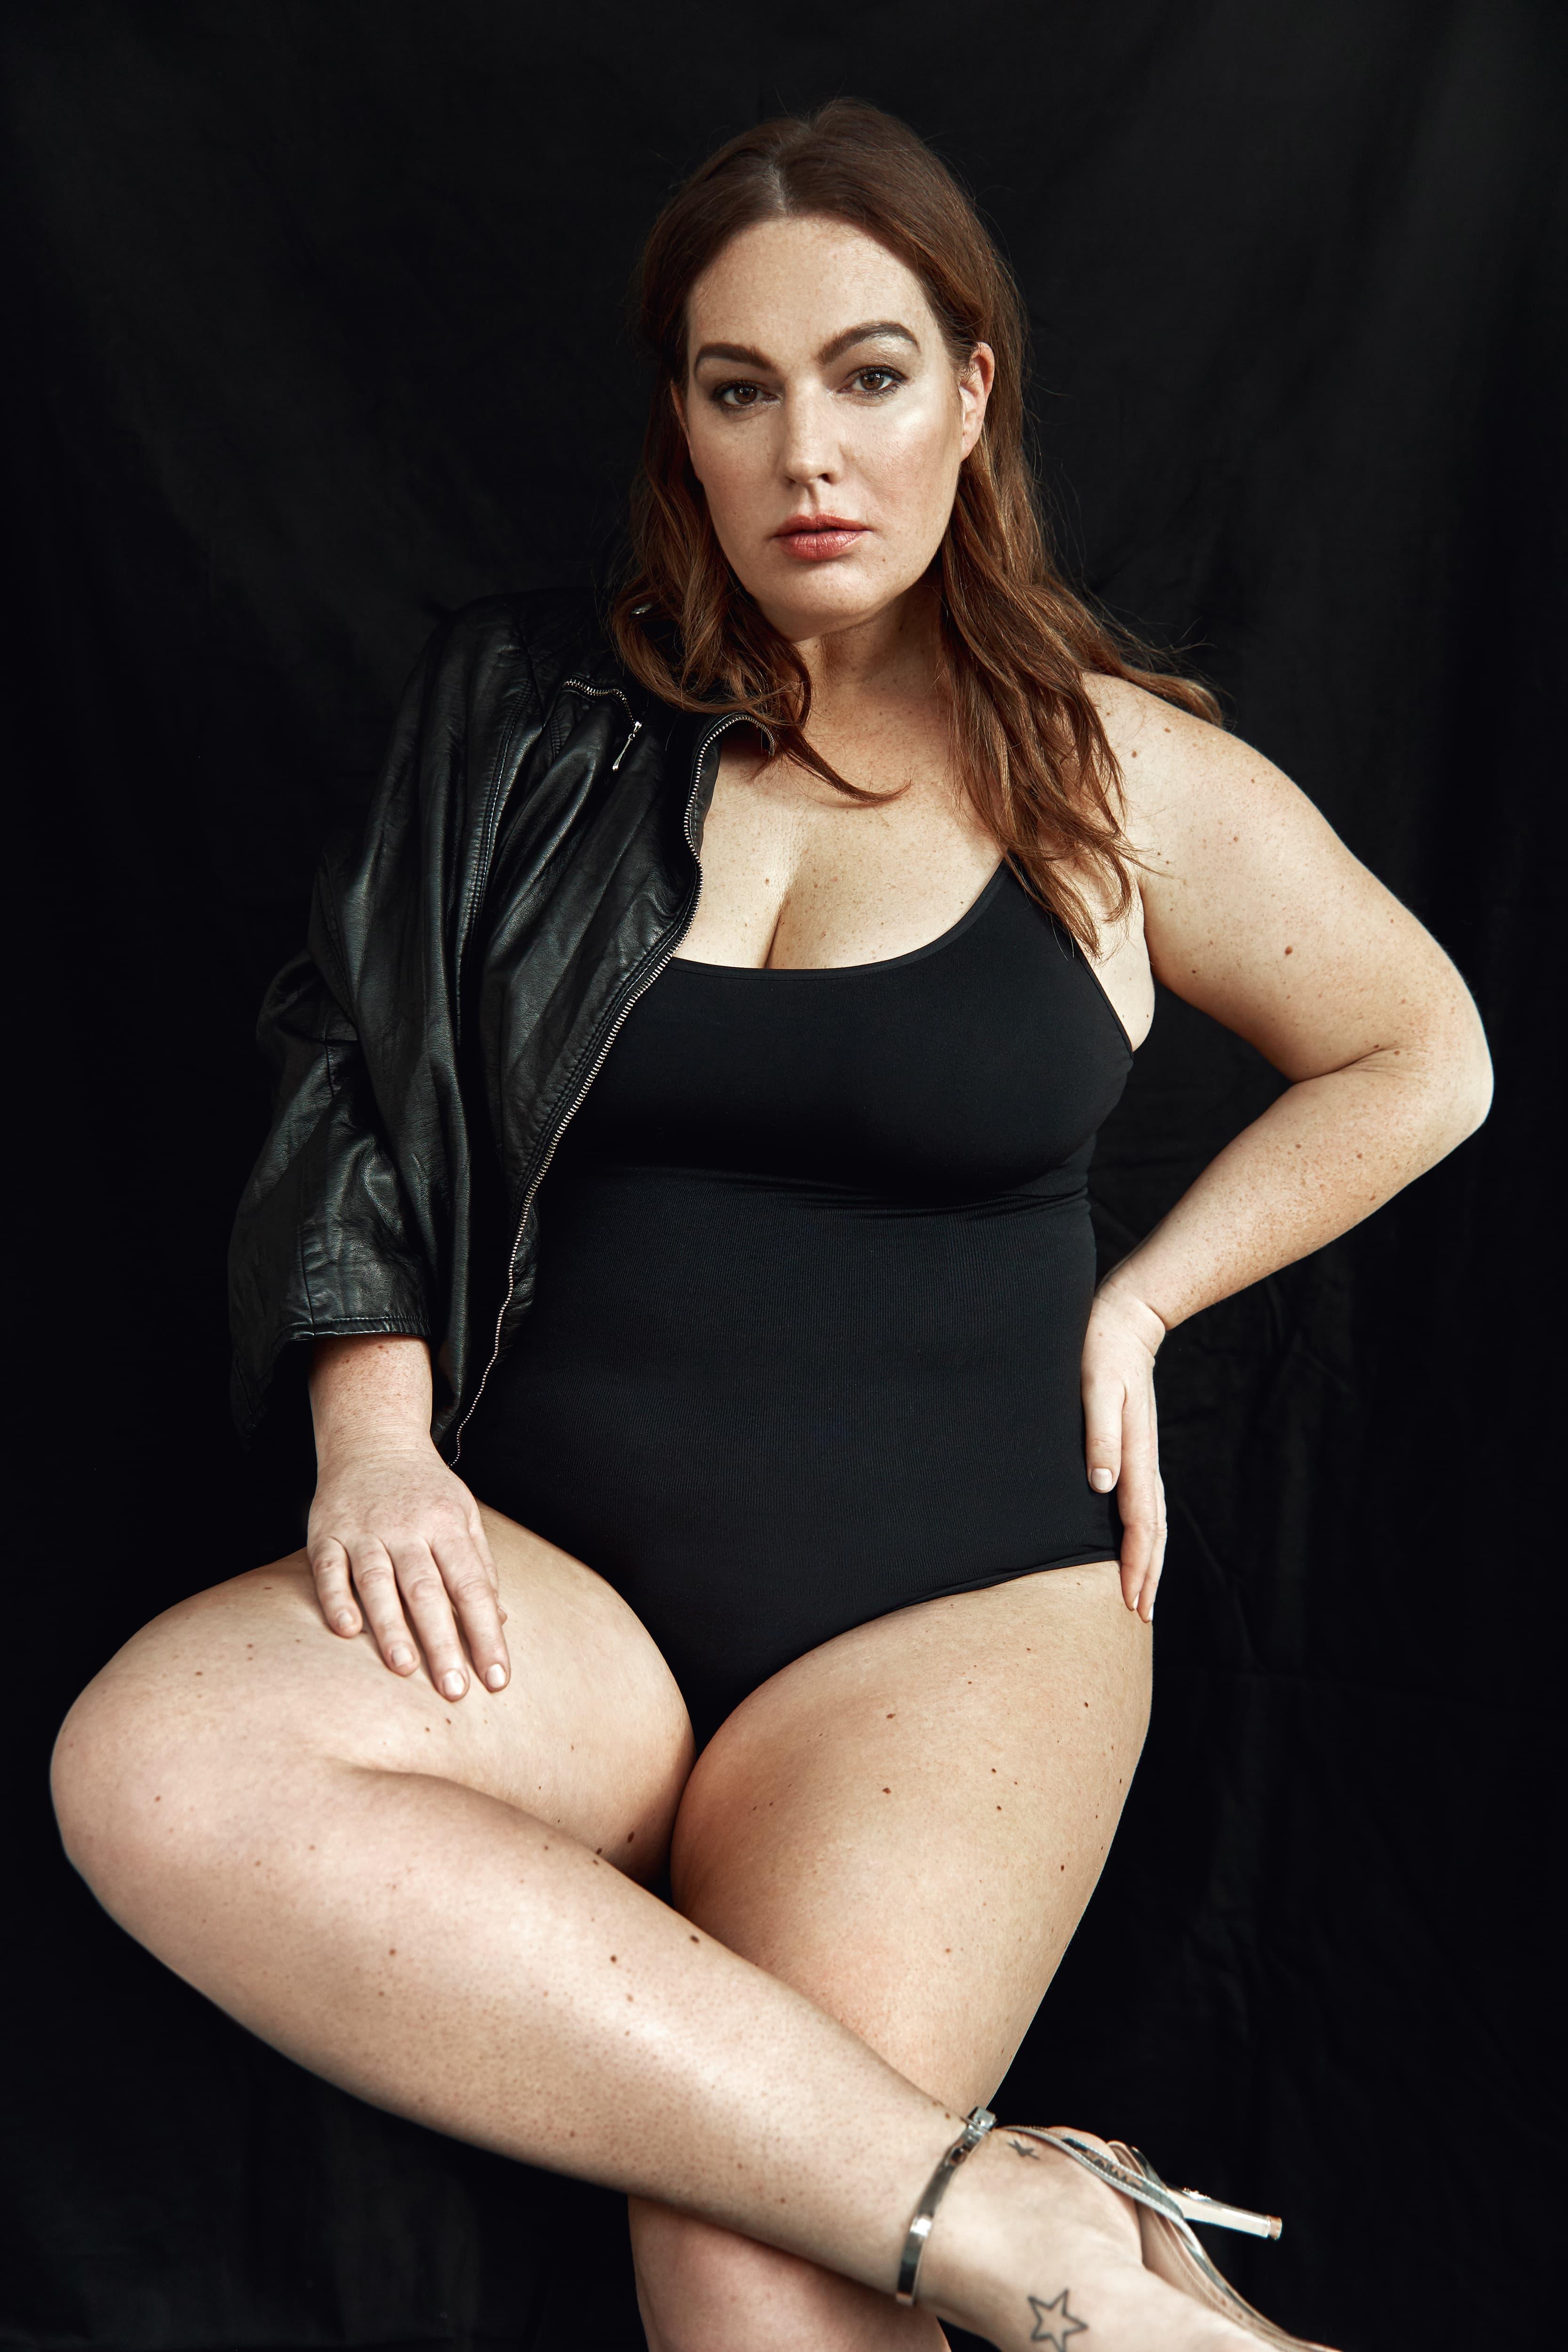 Plus Size Model im Wundercurves-Interview